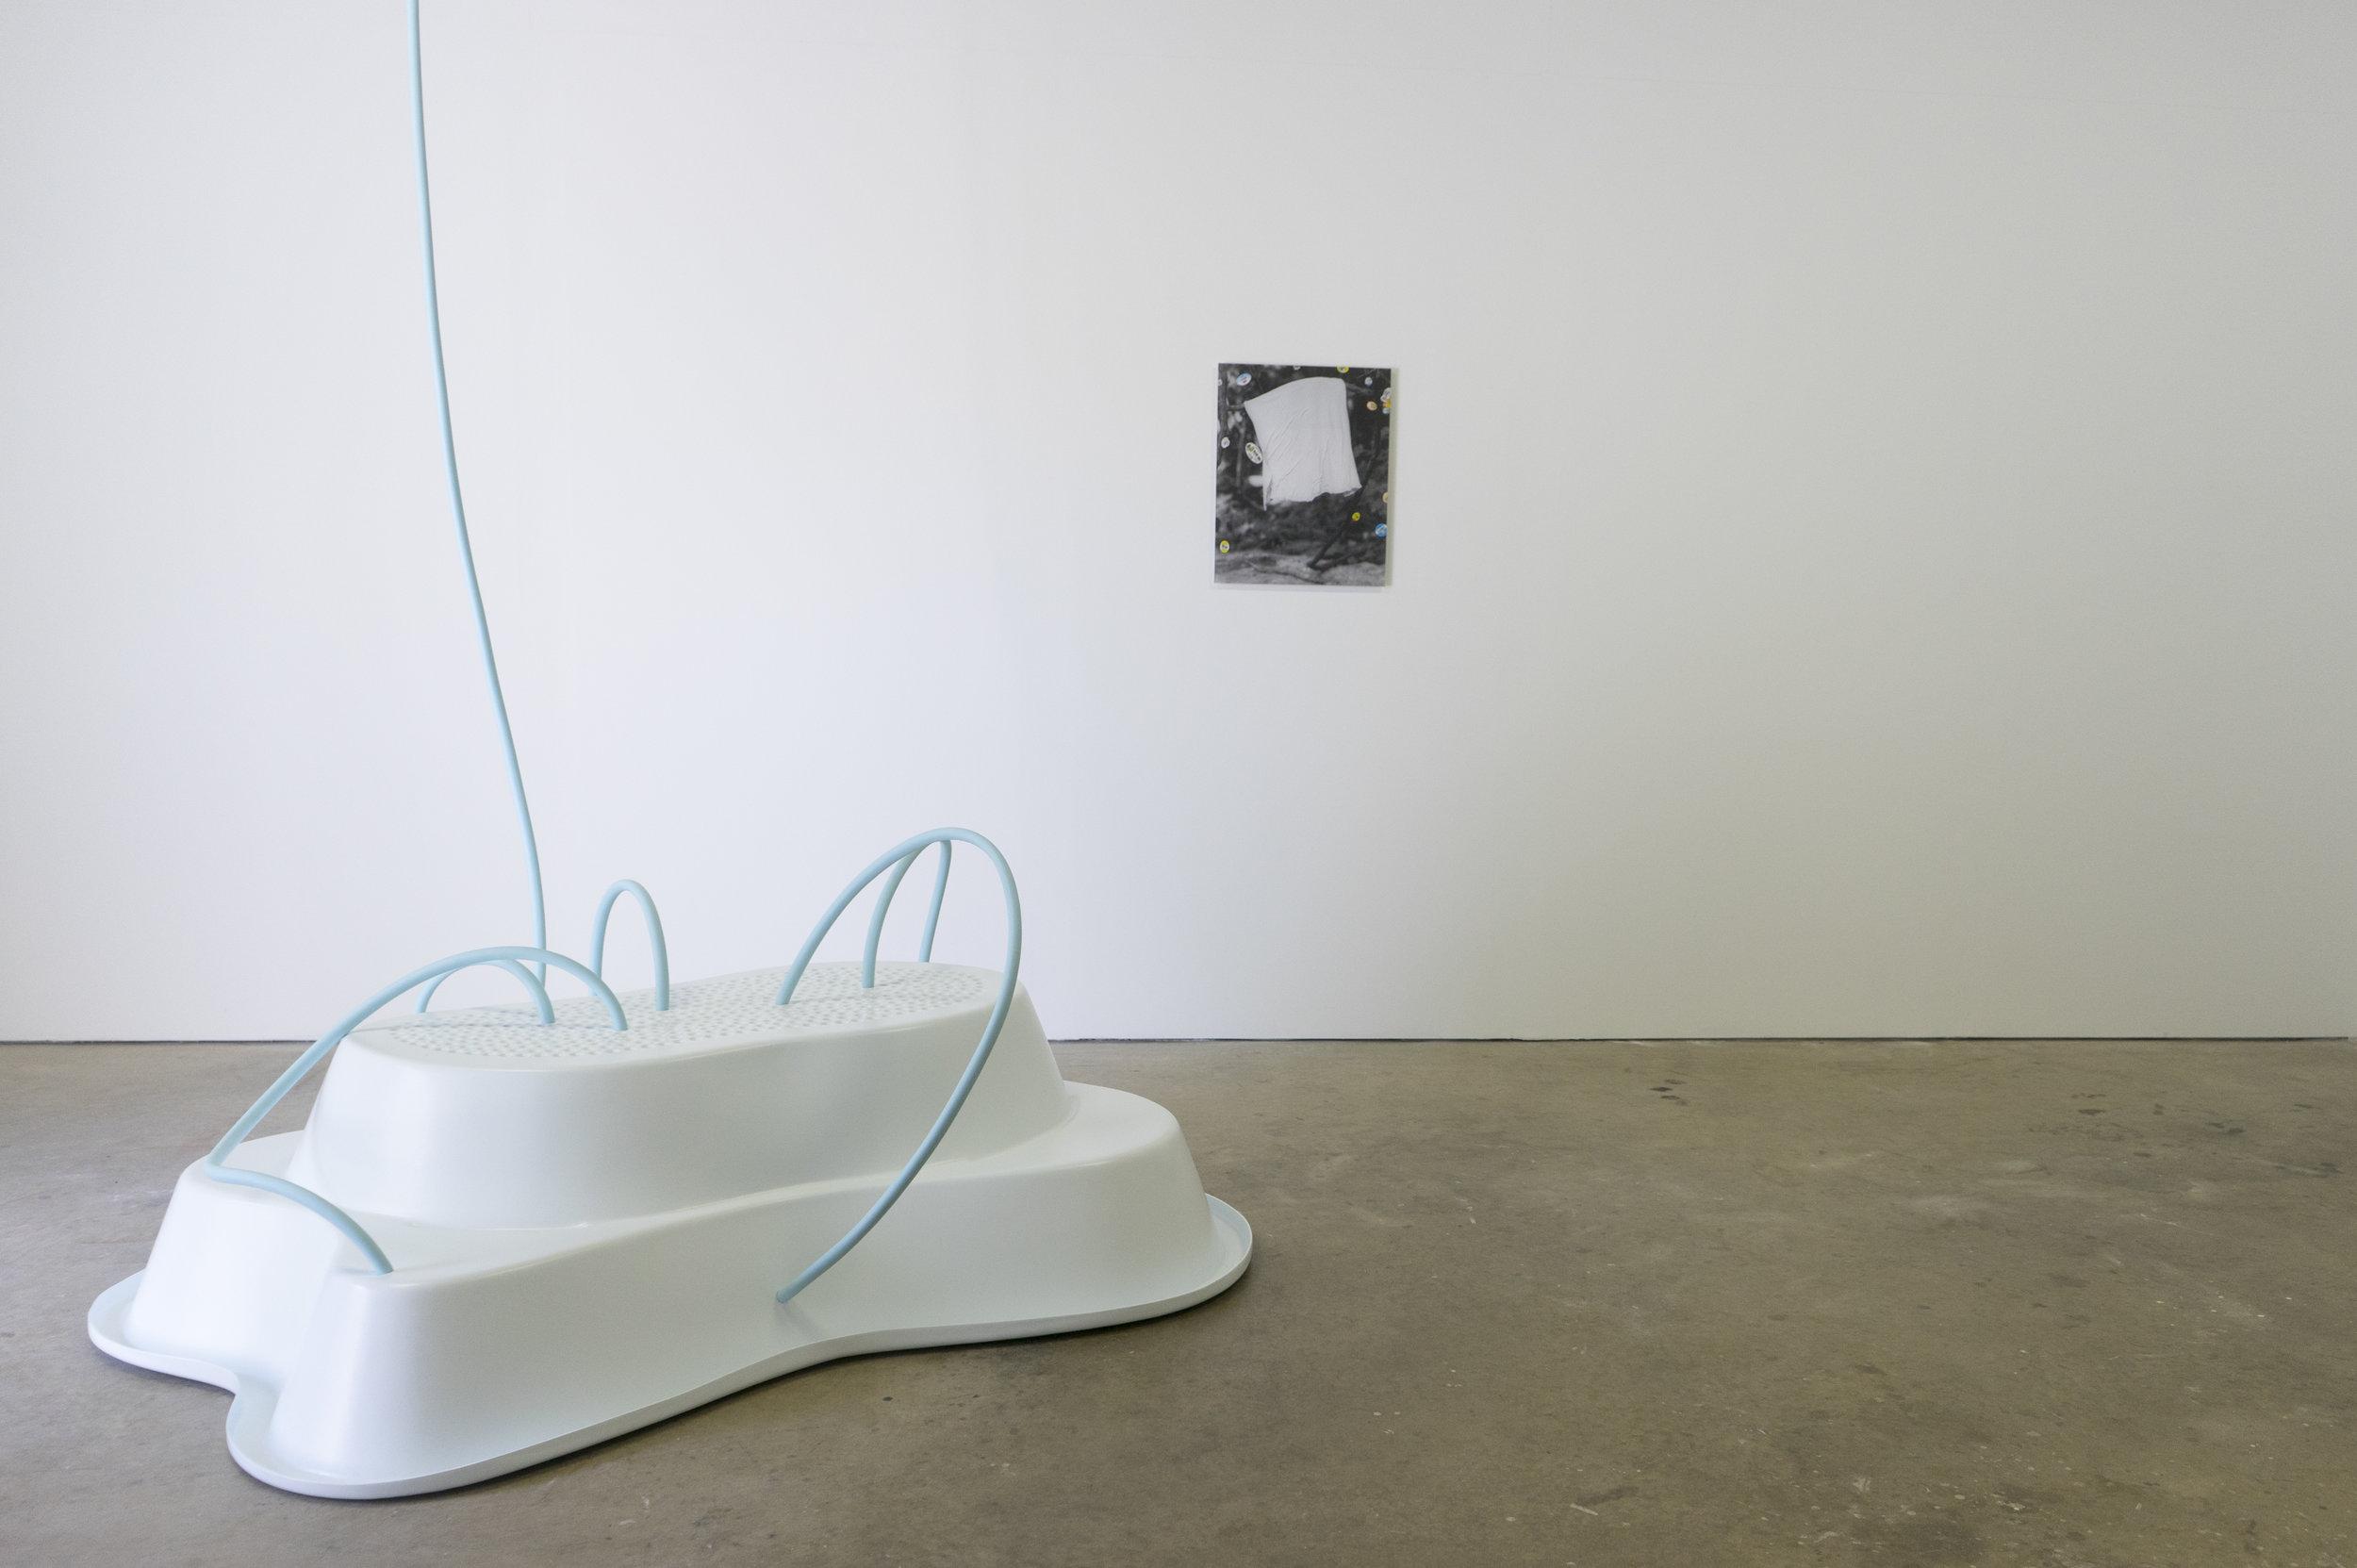 Jess Machacek   OCEANUS:OURANOS   2017  preformed pond, latex paint, garden hose  &  David King   Untitled   2015  pigment print on plexiglass and produce stickers